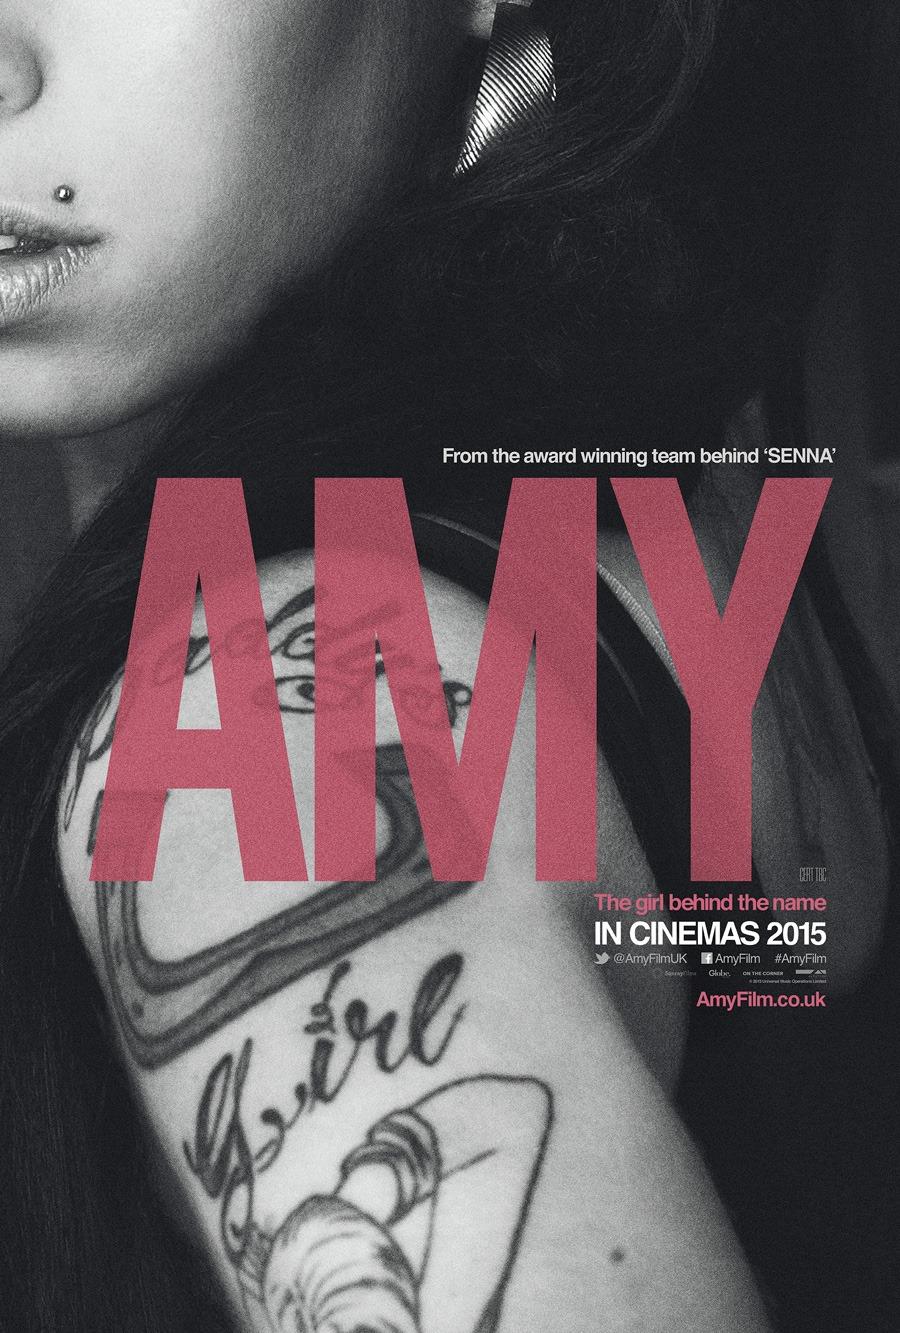 Amy Winehouse film poster designed by Wonderland